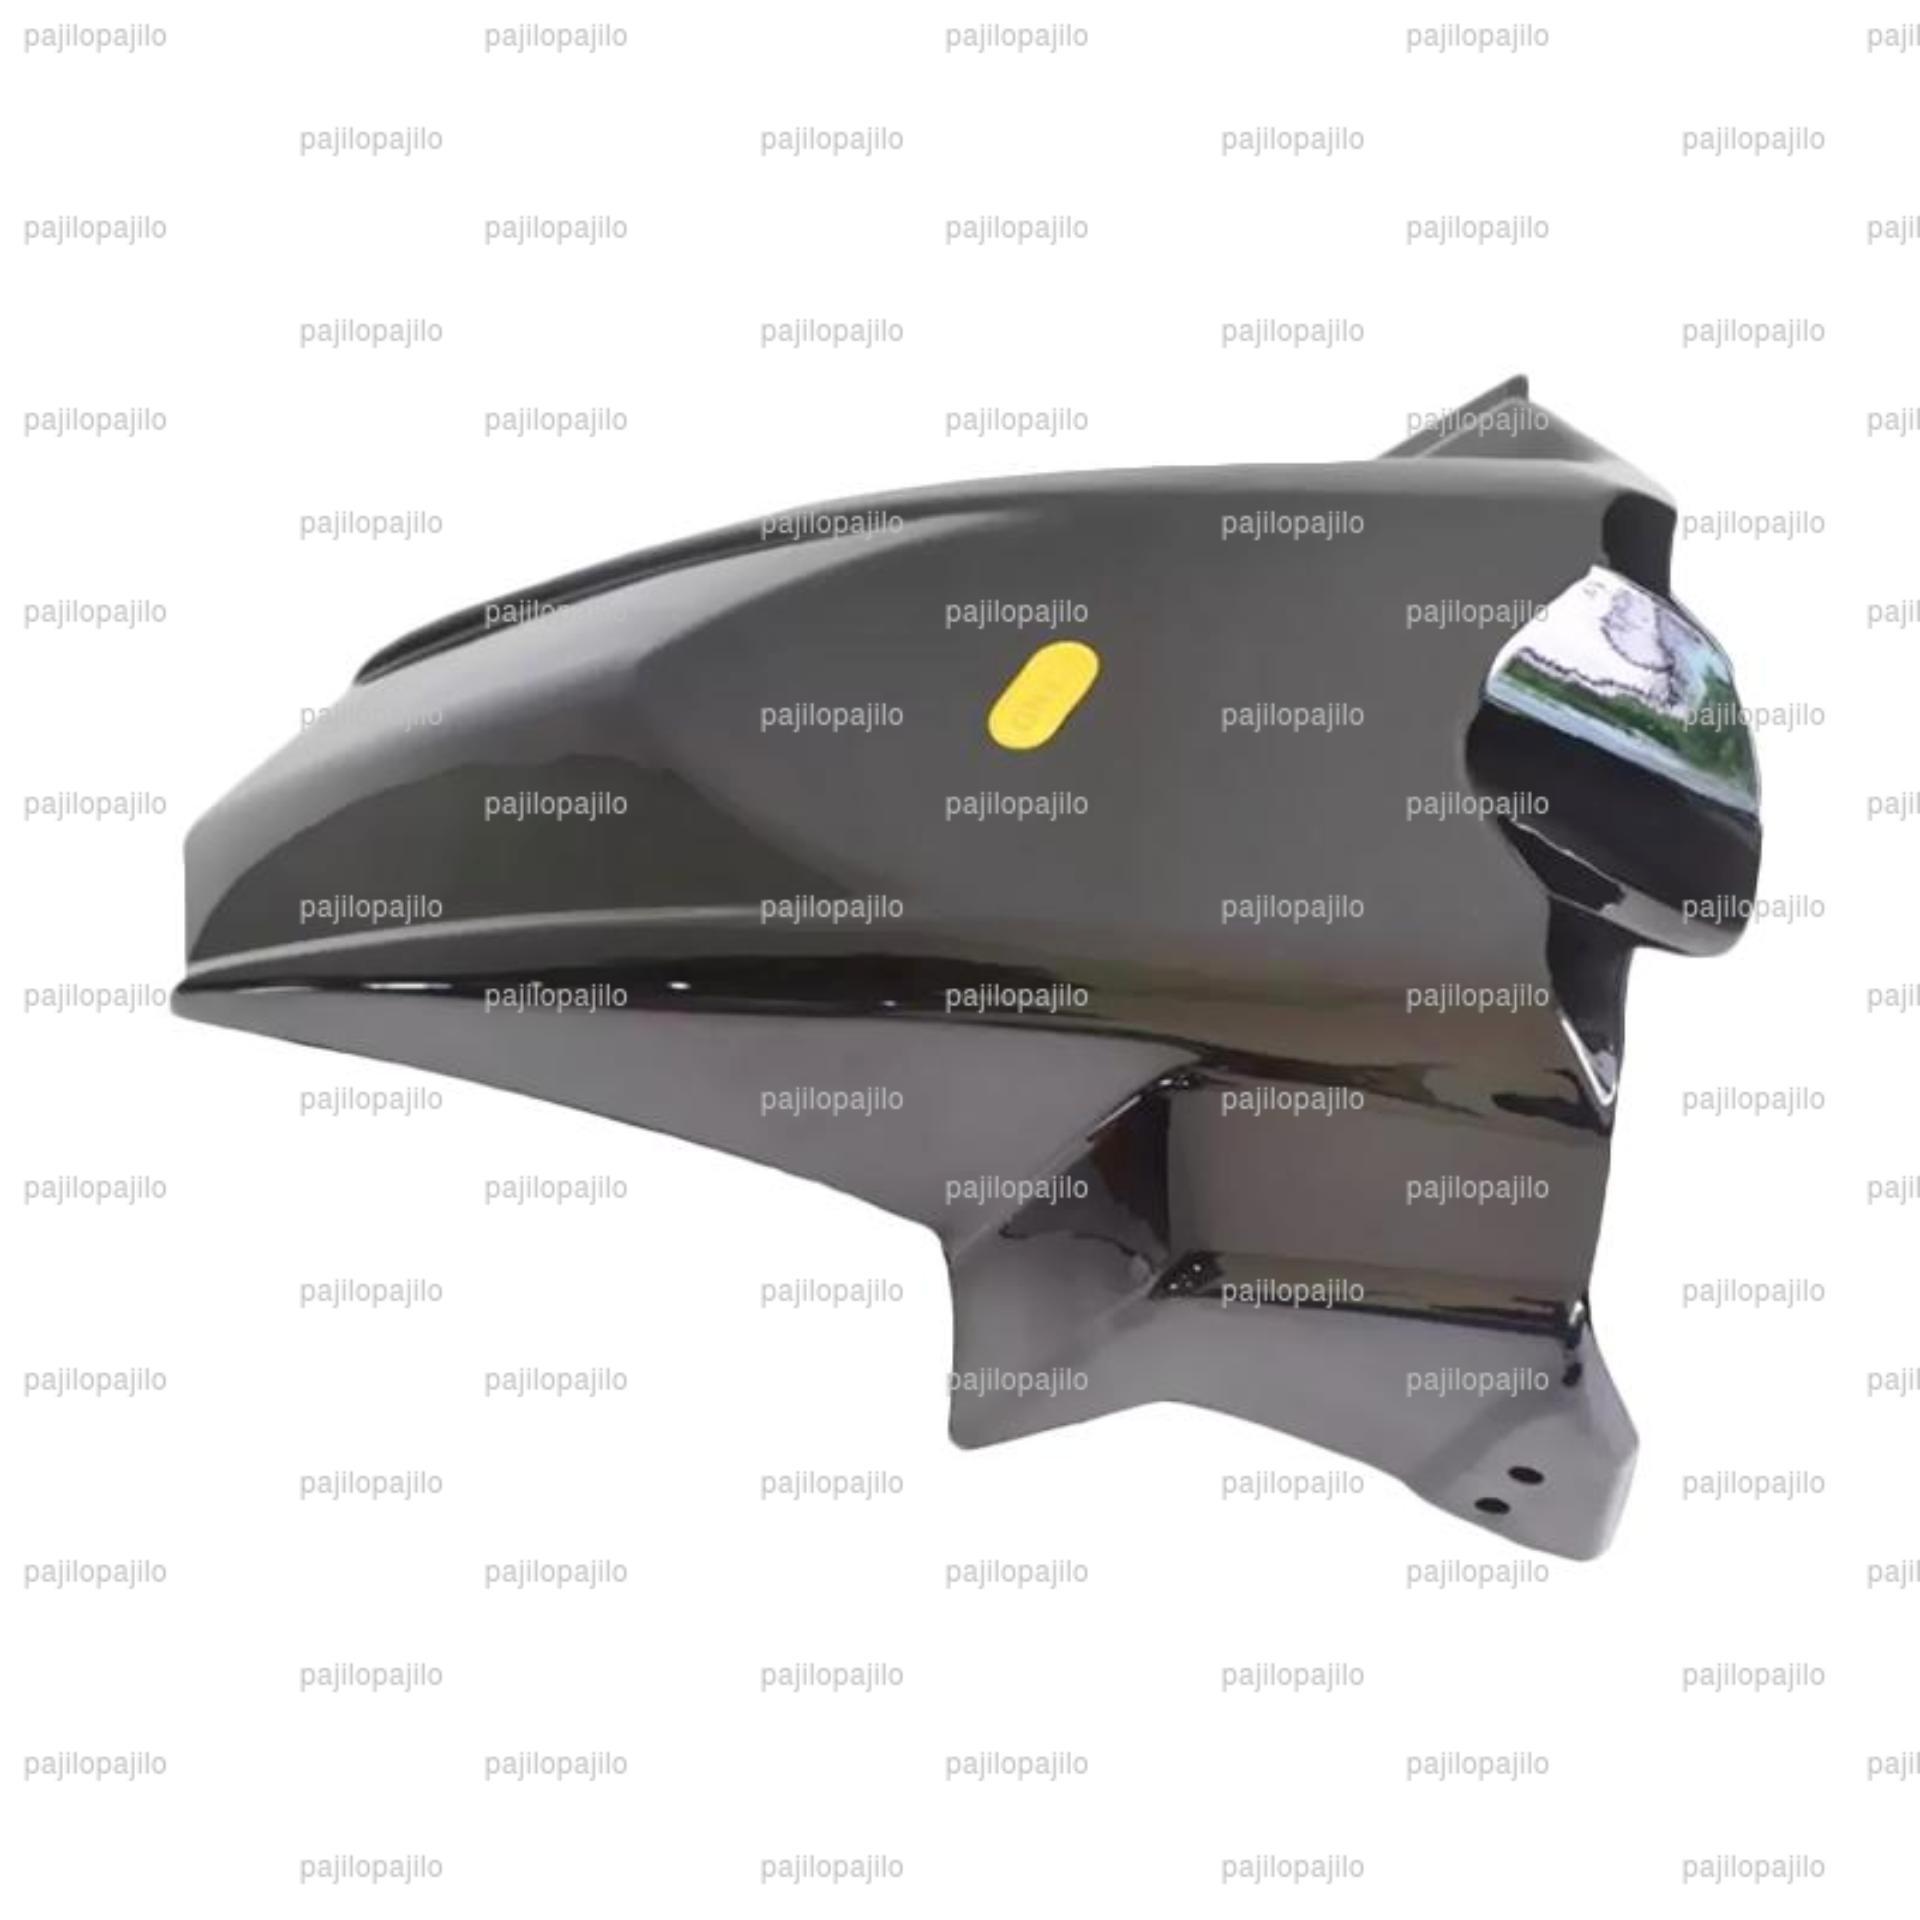 Silver - Yamaha Nmax Rear Huger Spakbor Spatbor Kolong AksesorisBelakang Motor Sporty